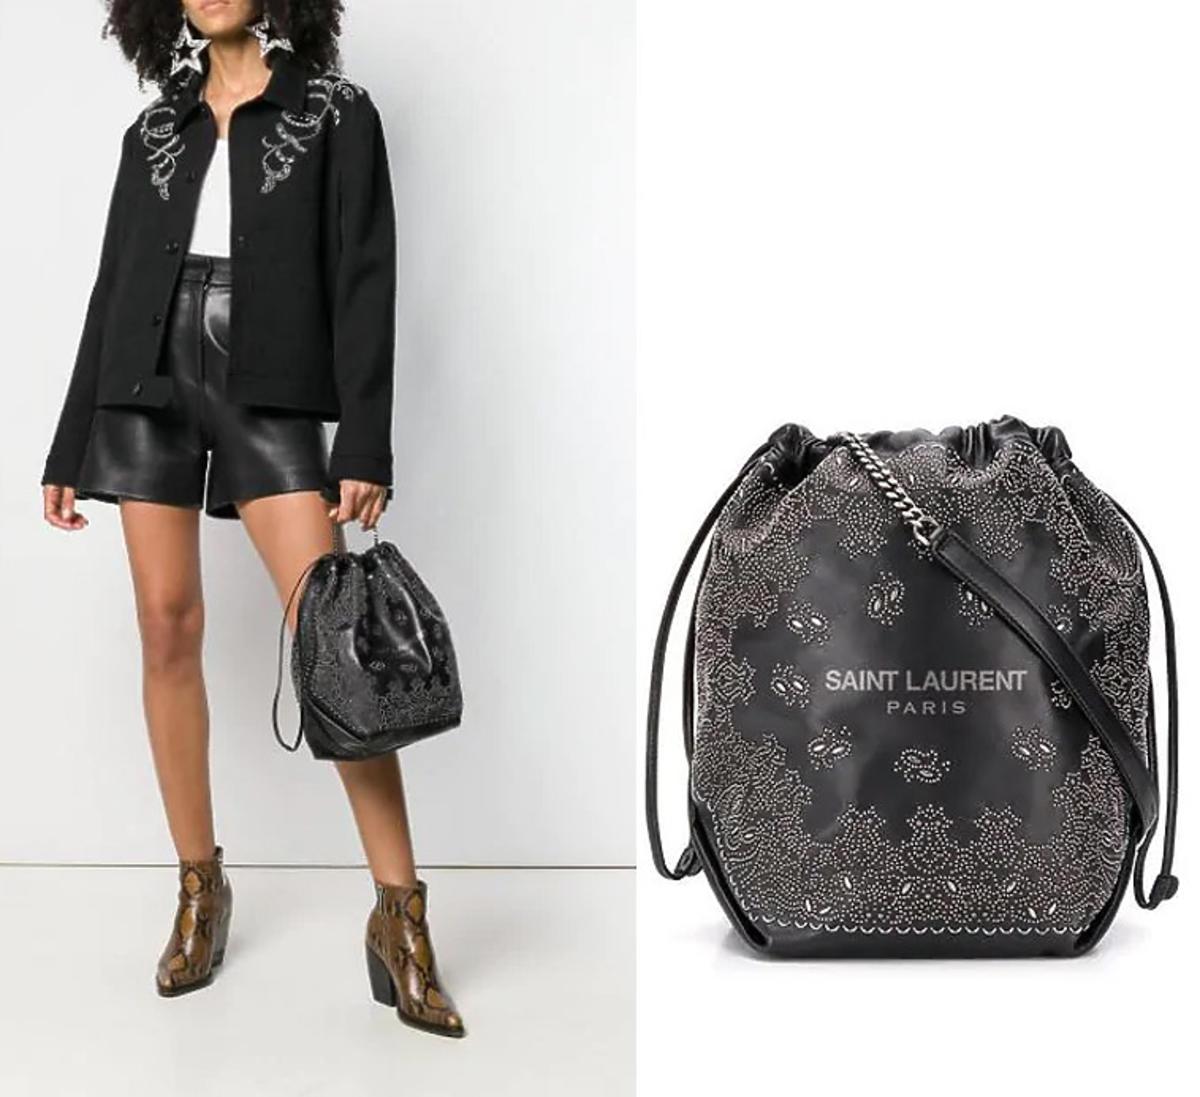 Czarna torebka Saint Laurent, bucket bag, za 9 tys. zł